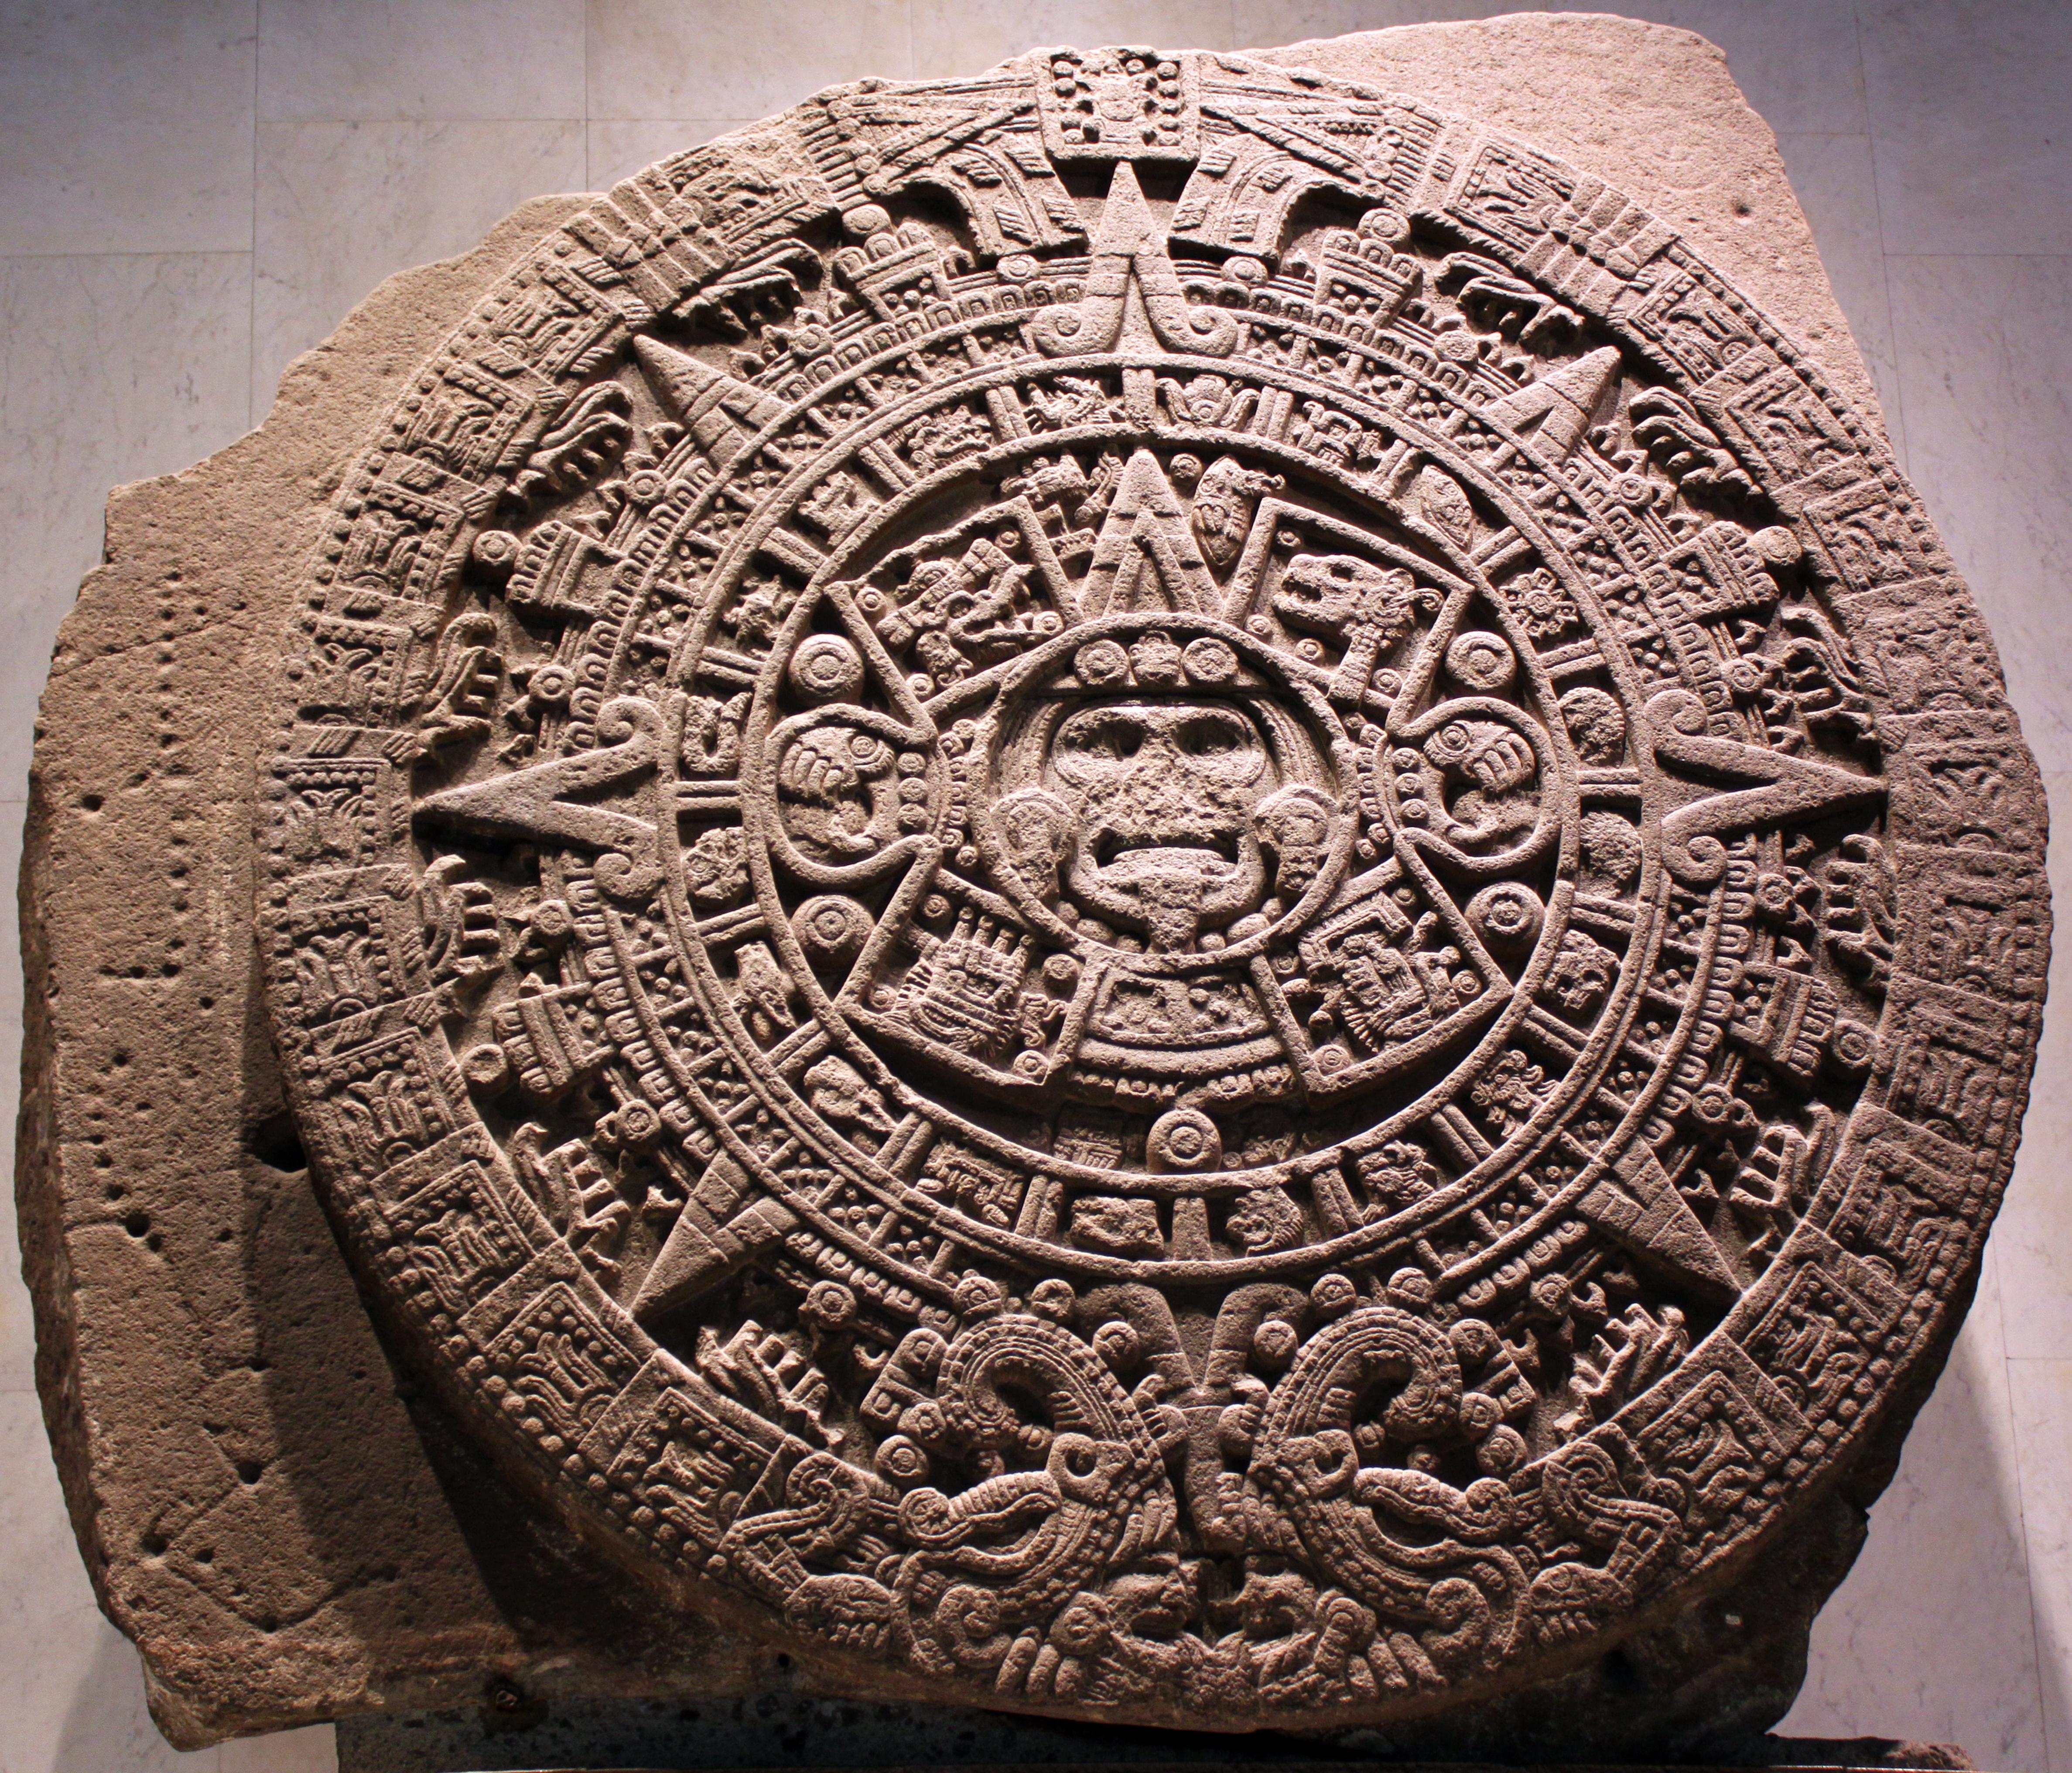 Aztec calendar stone - Wikiwand